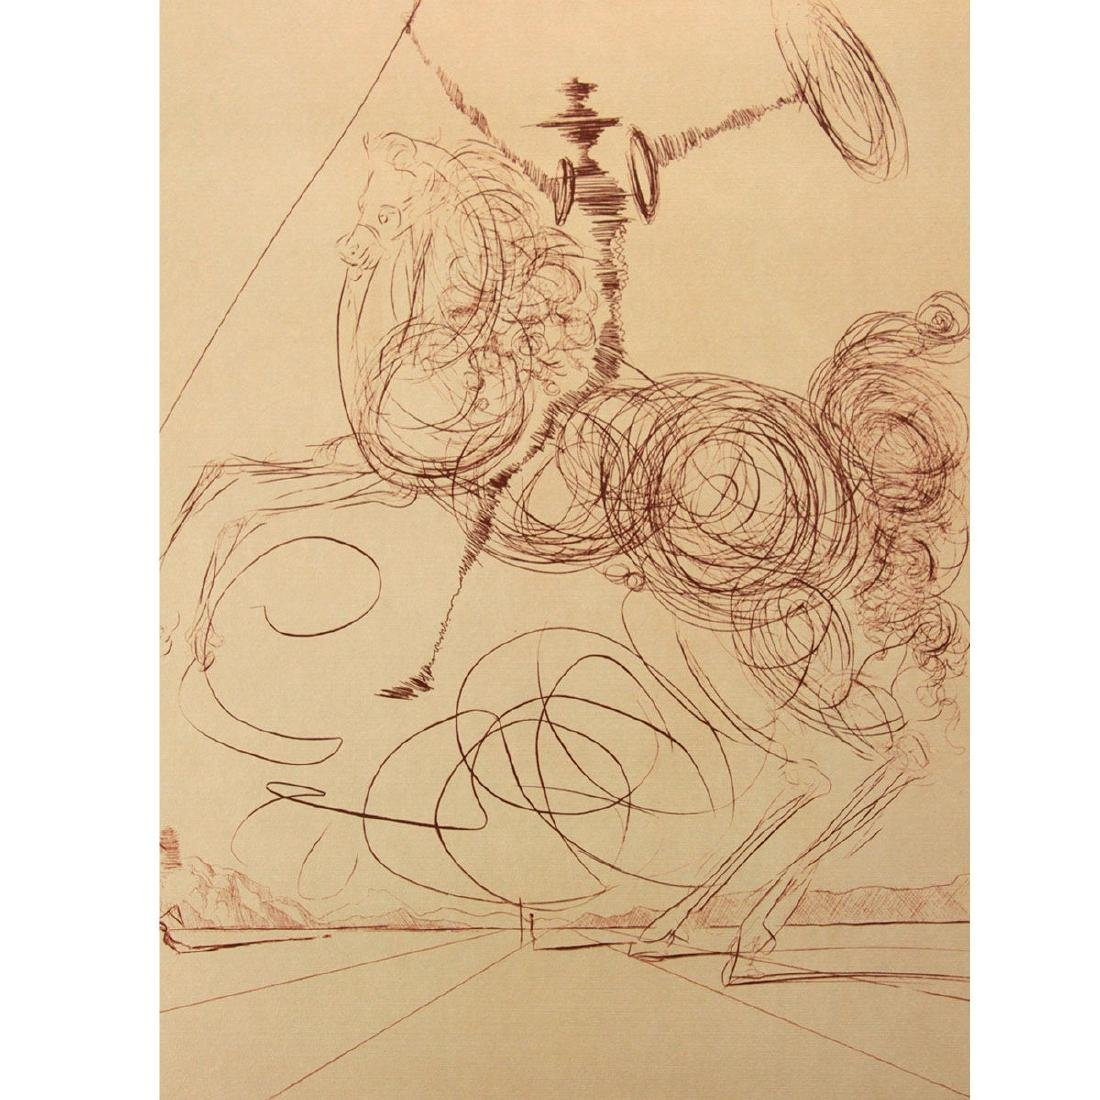 Salvador Dali - Don Quichotte (Quixote), Signed